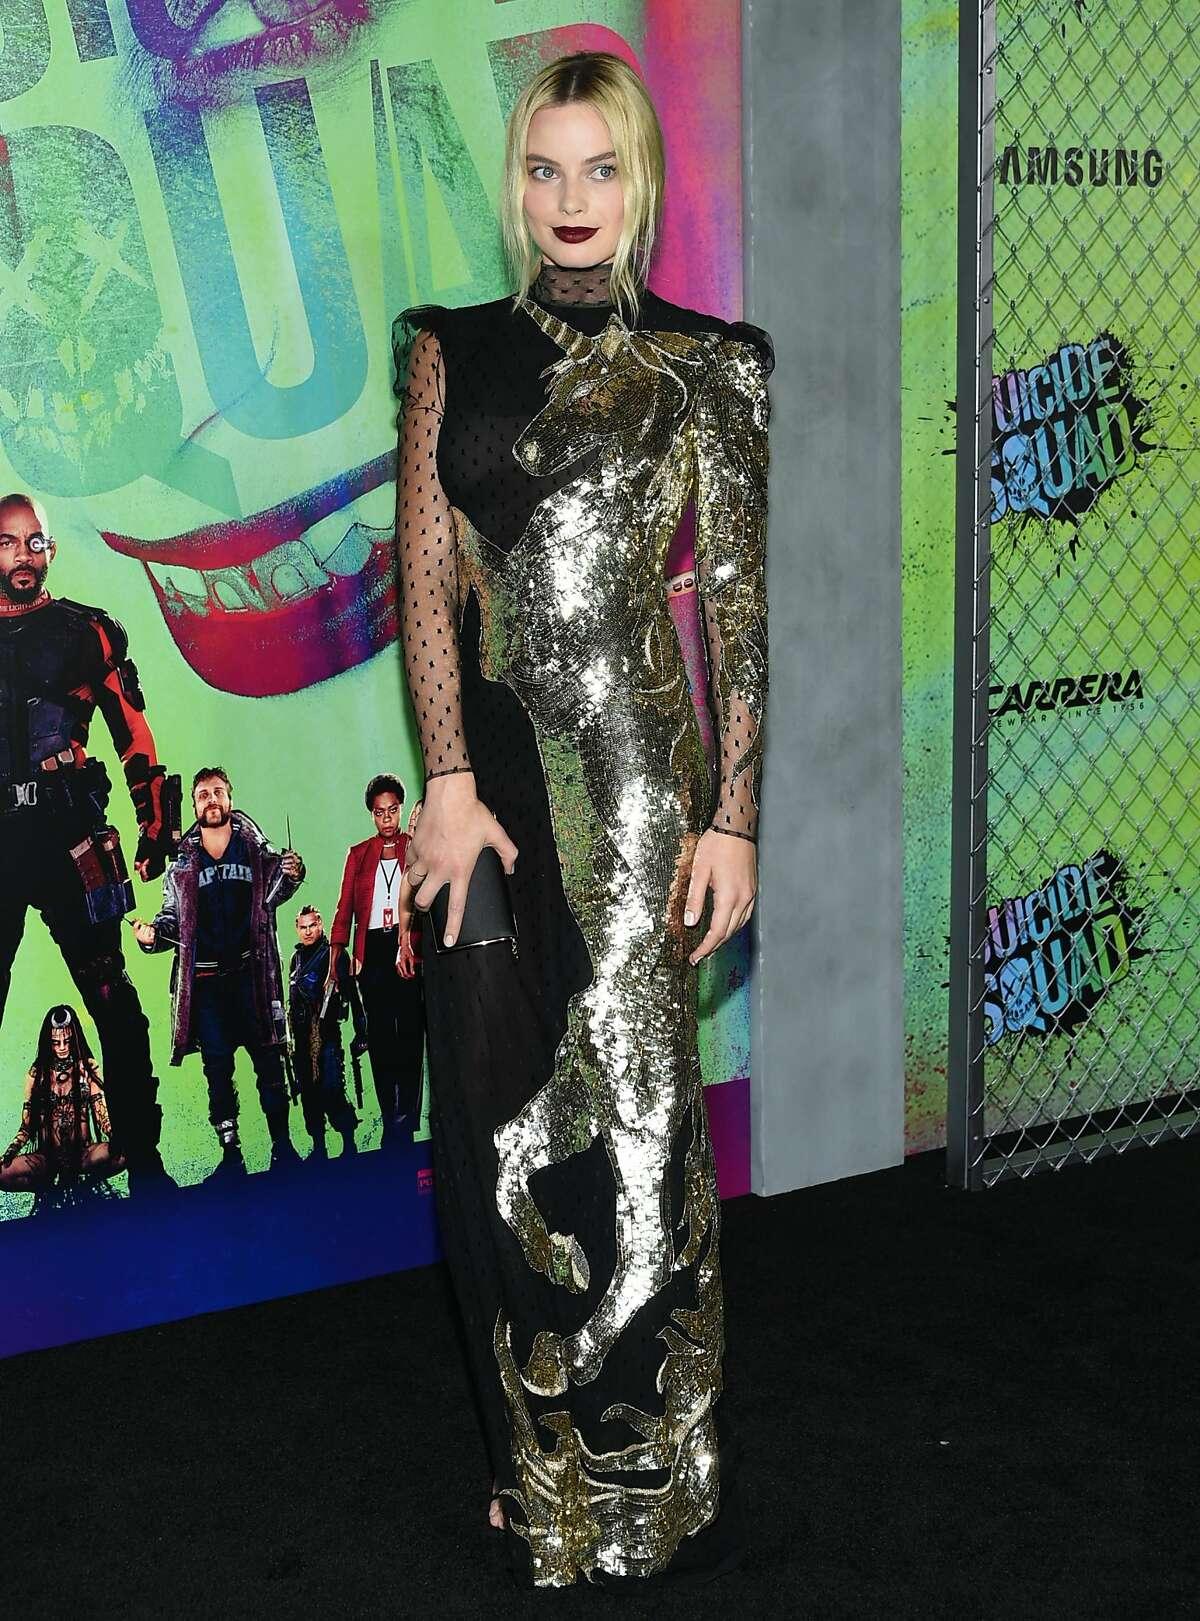 Margot Robbie attends the world premiere of